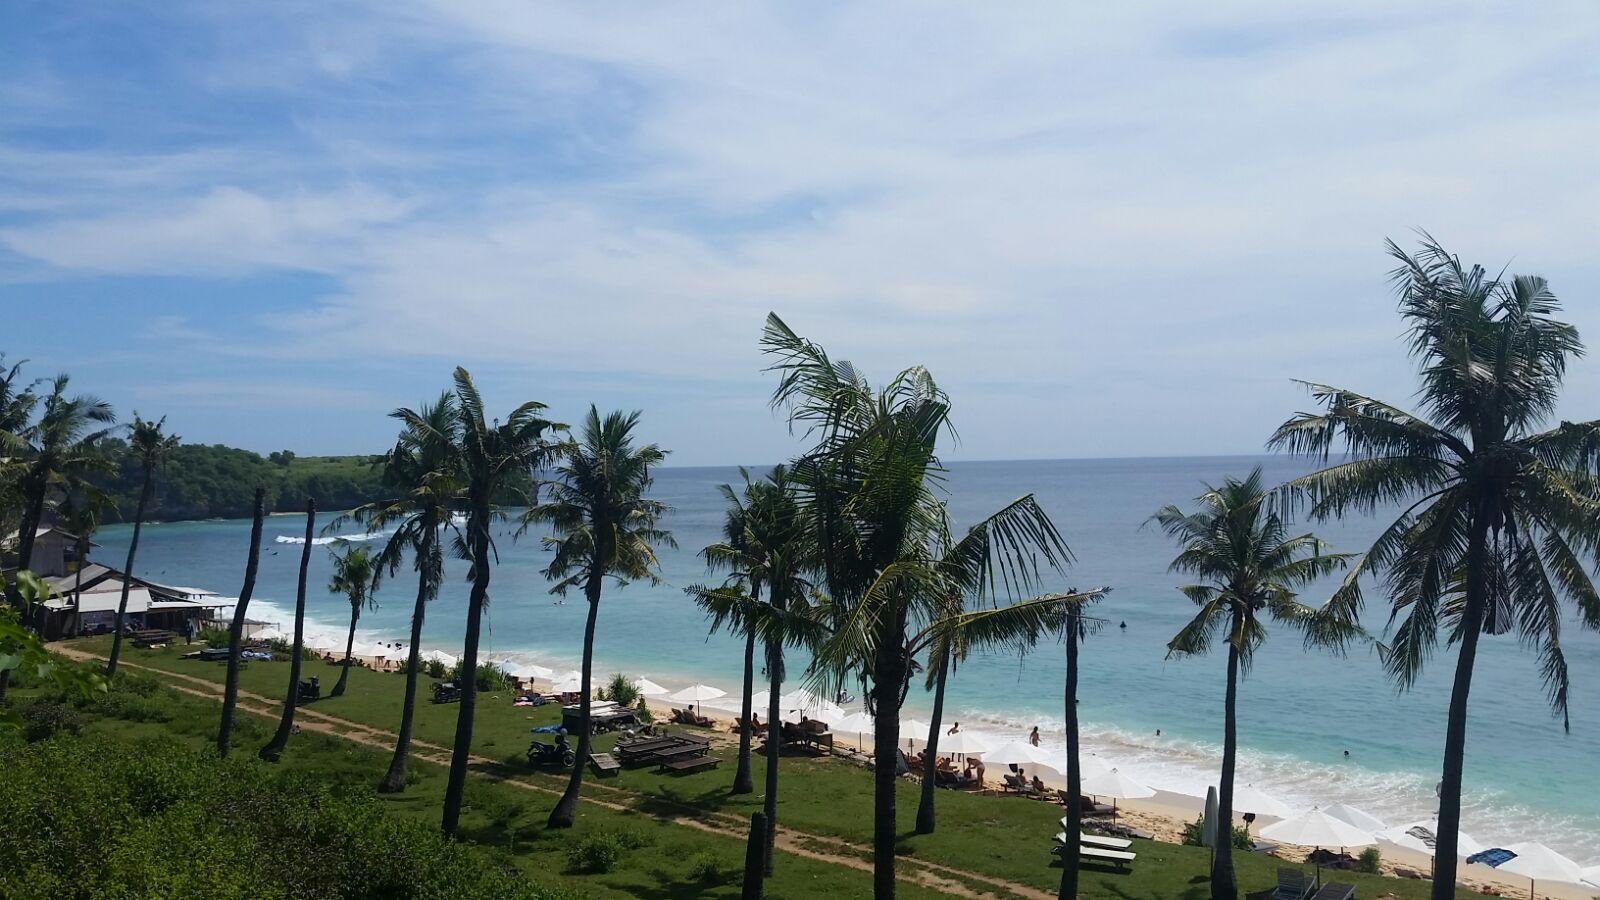 Balangan Beach. Photo via Melali Bingin